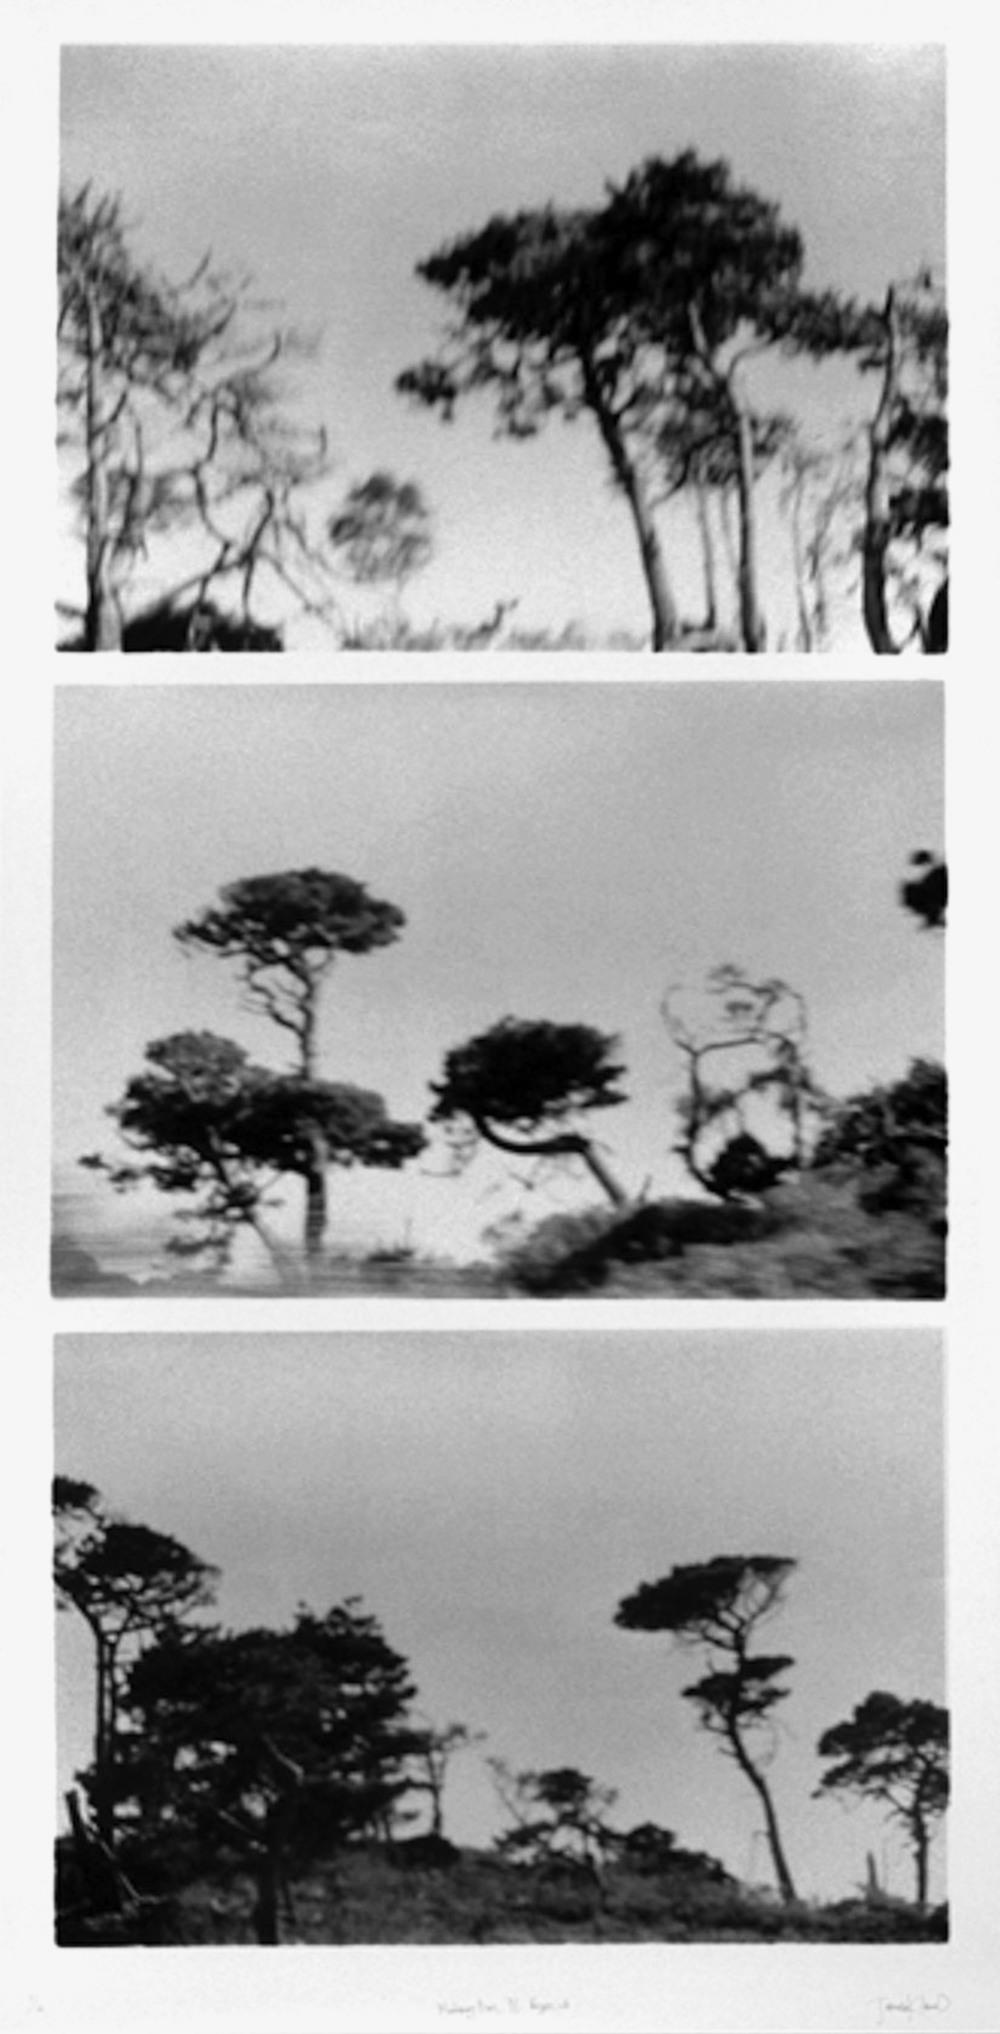 Monterey Pines, Pt. Reyes, CA